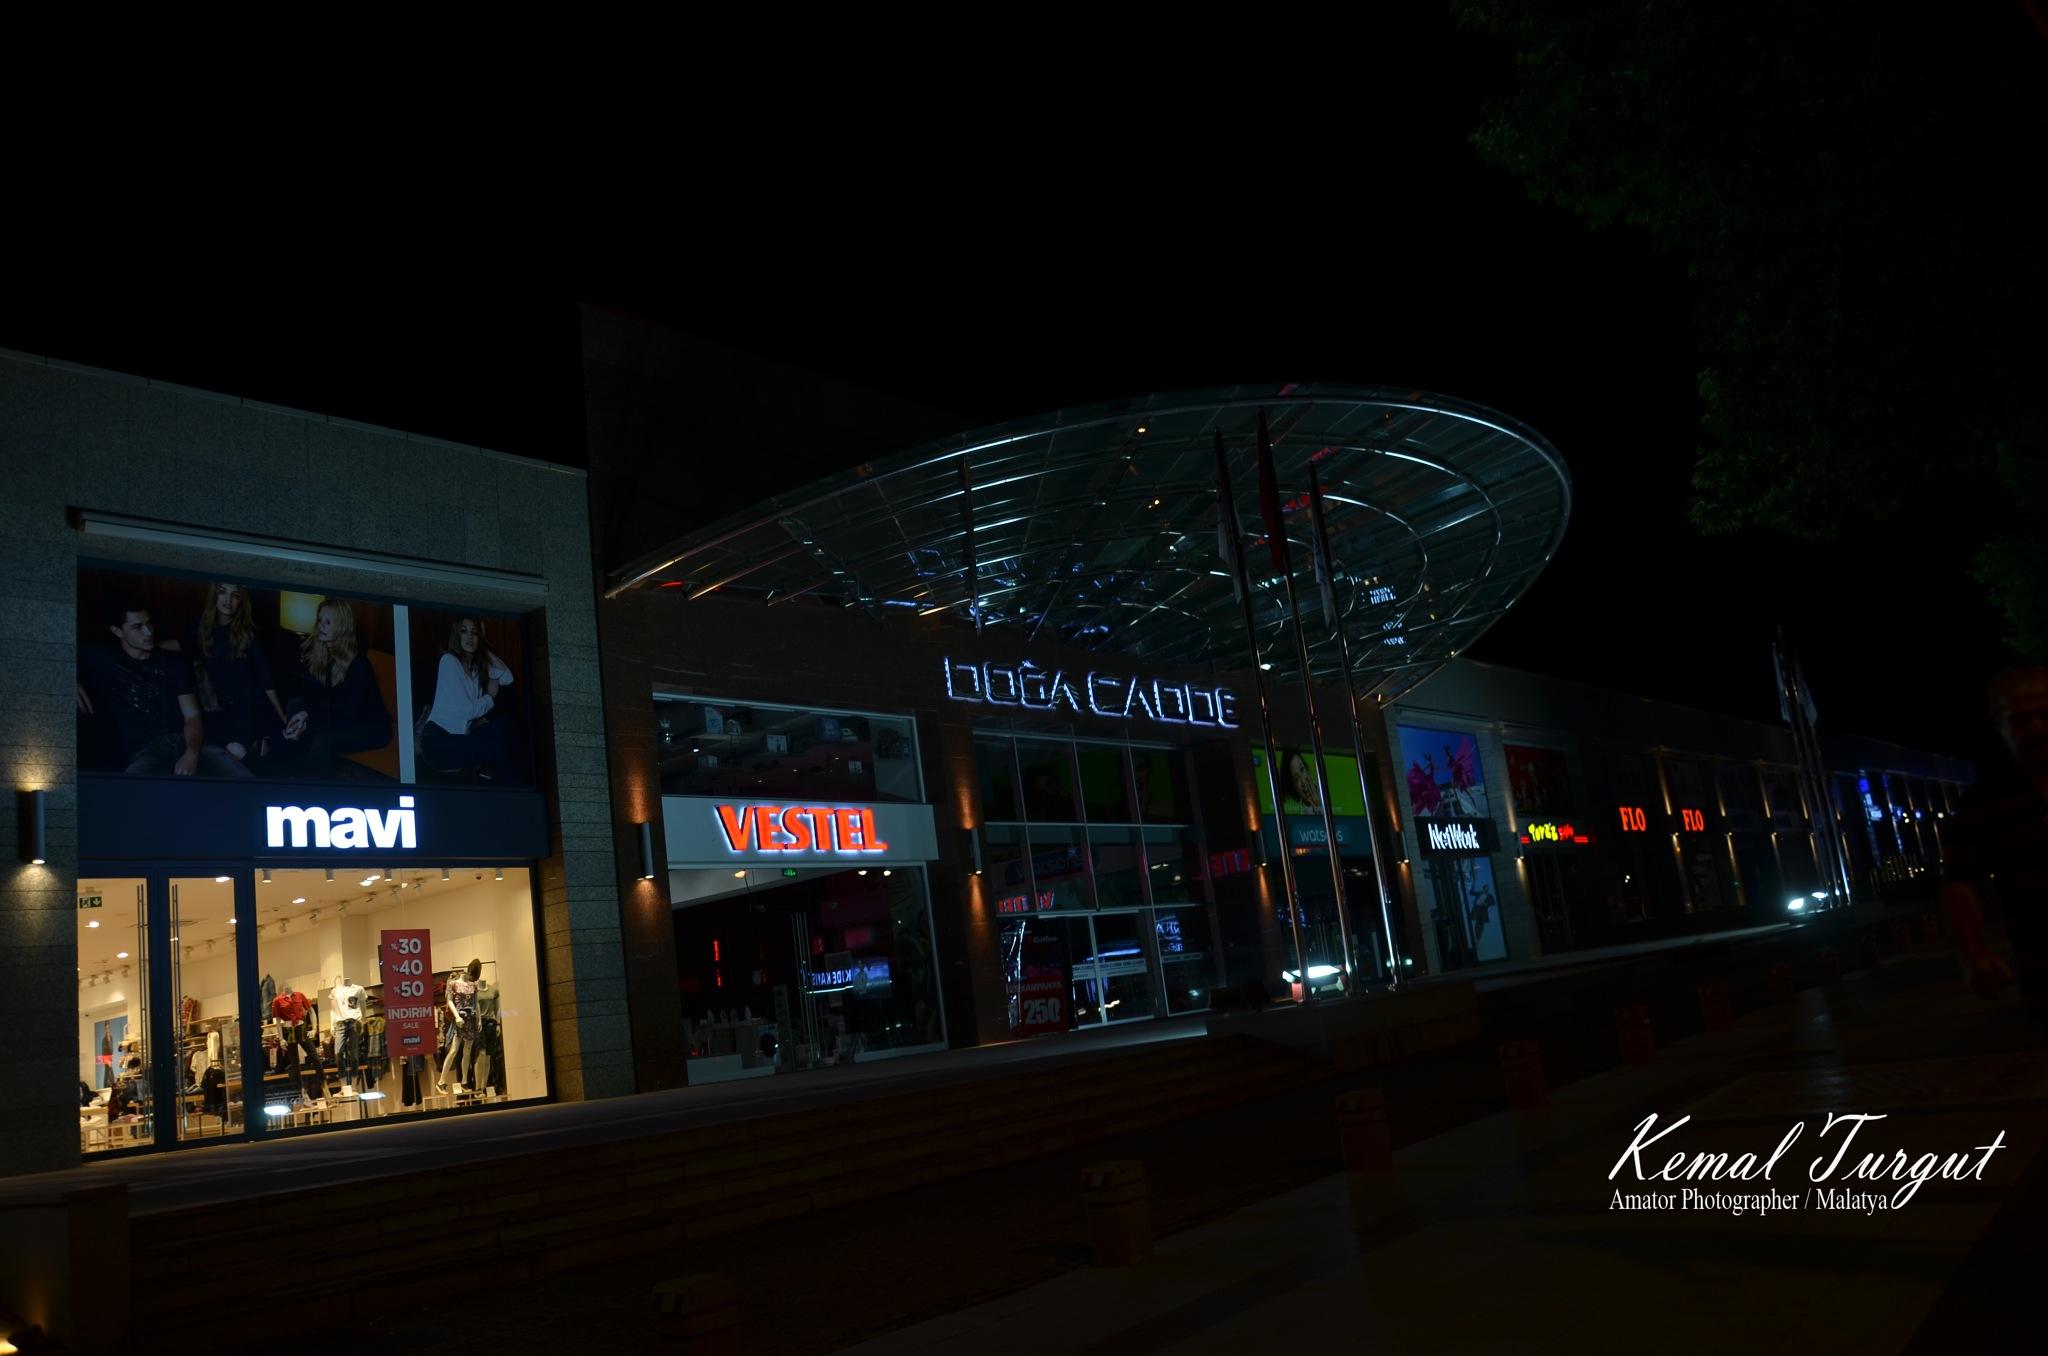 Doğa Cadde AVM by Kemal Turgut